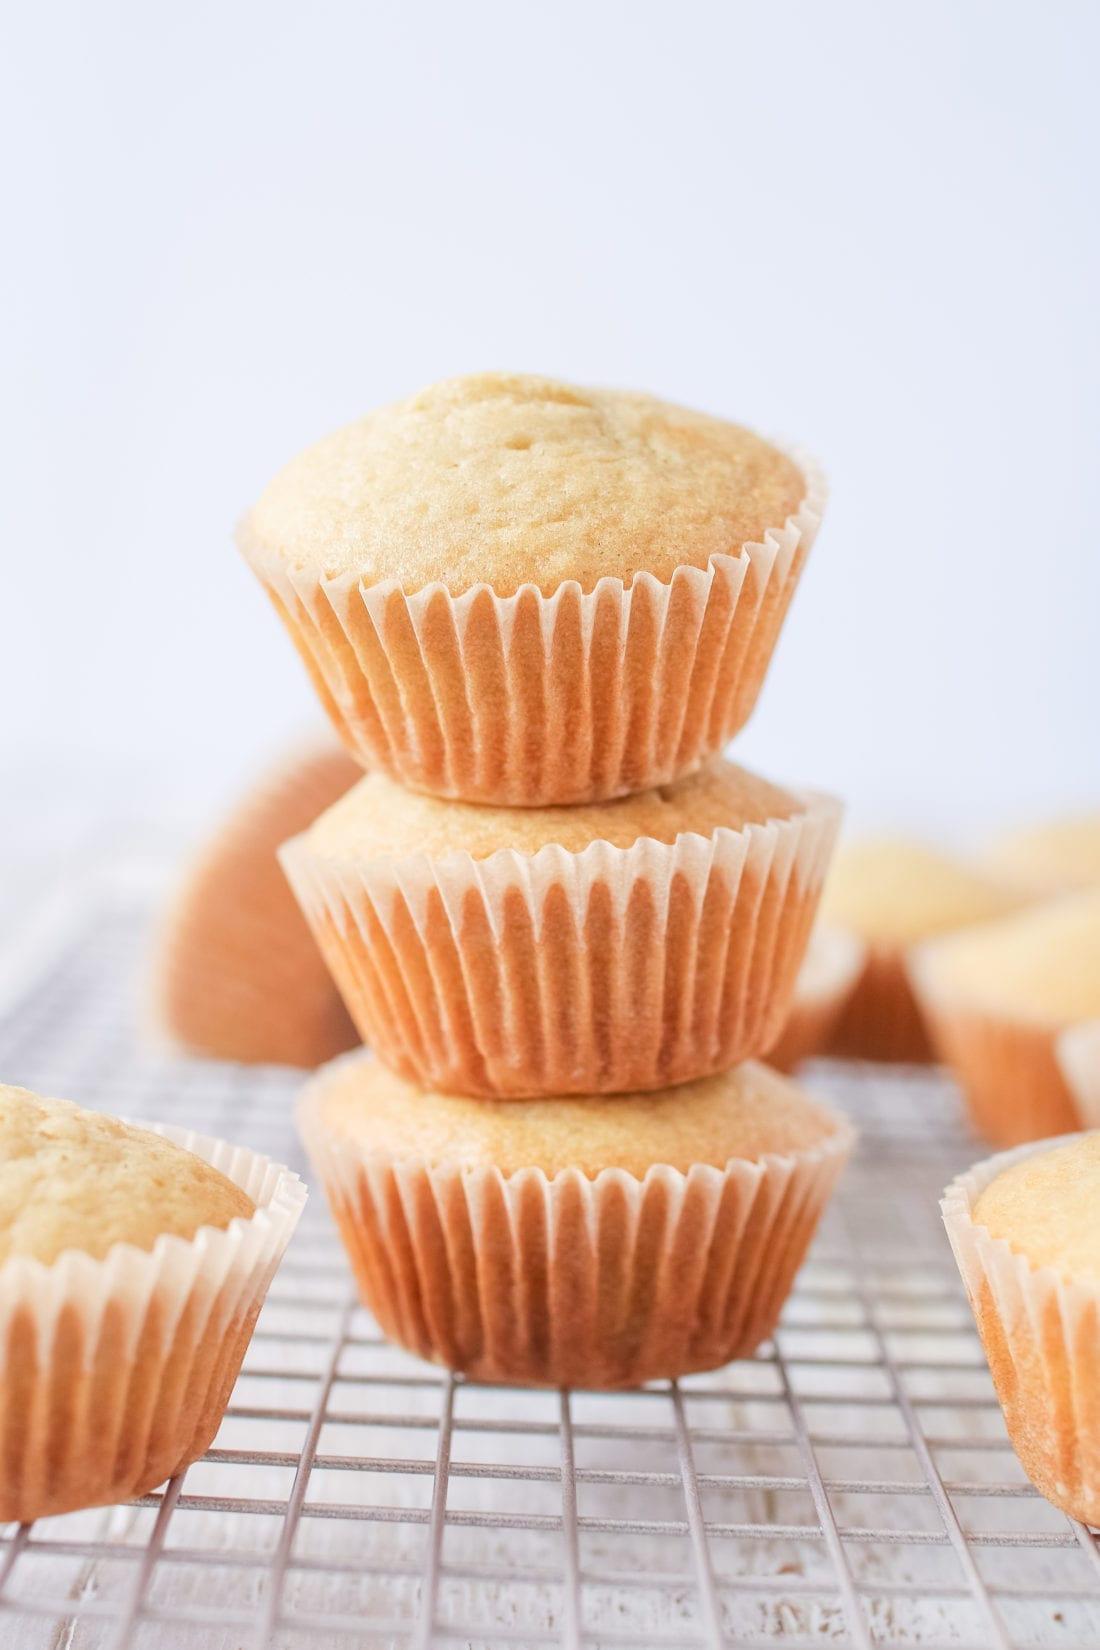 Perfect Cupcake Baking Class